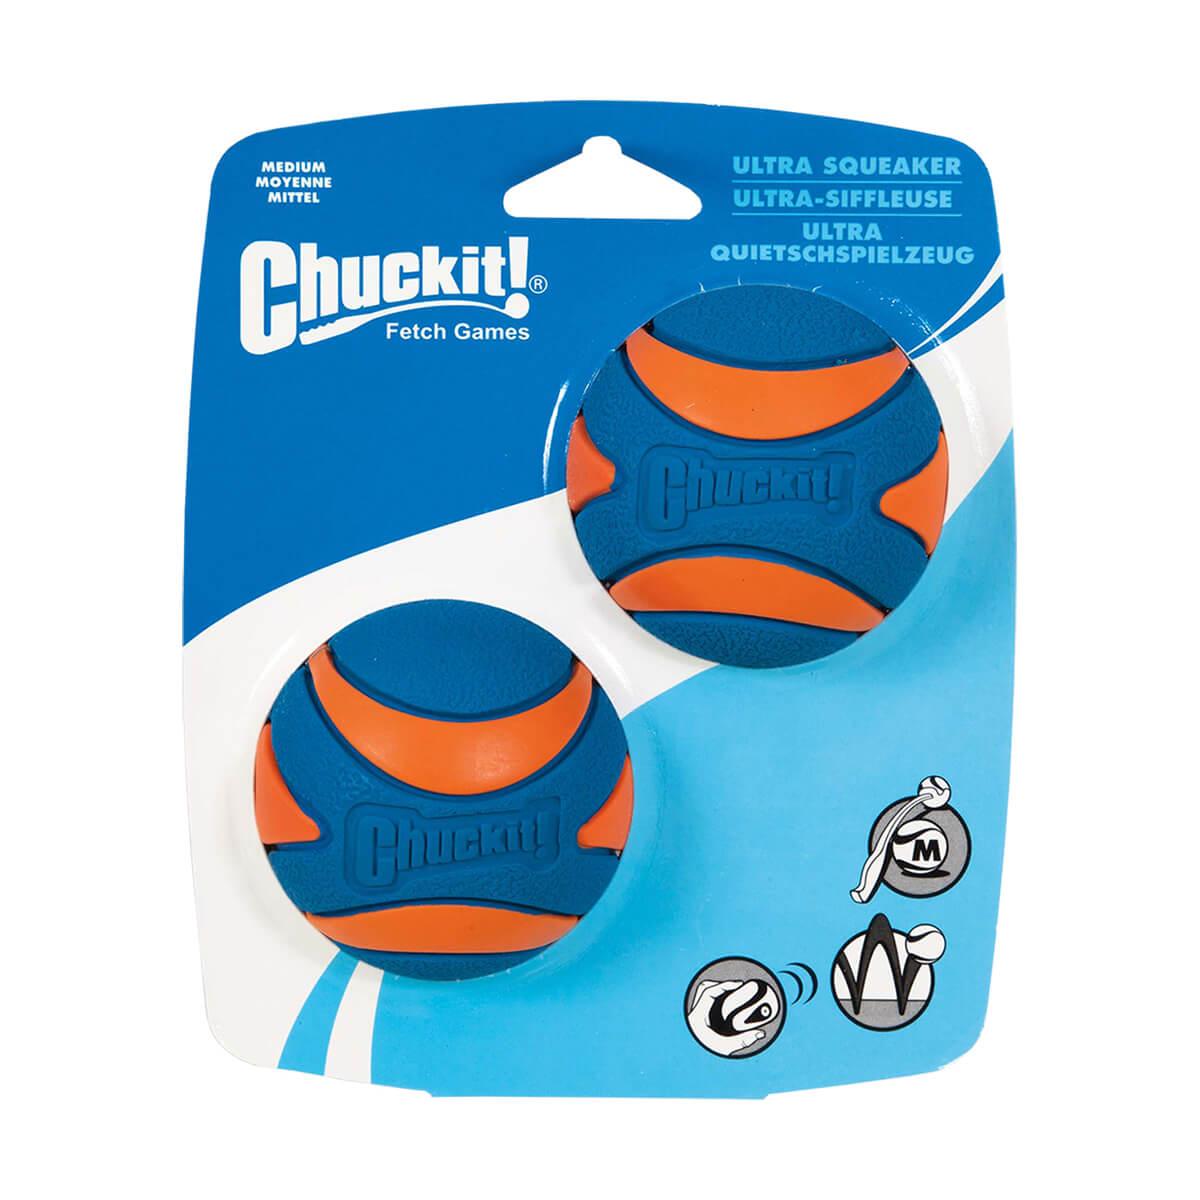 Chuckit! Ultra Squeaker Ball Dog Toy - Medium - 2 Pack